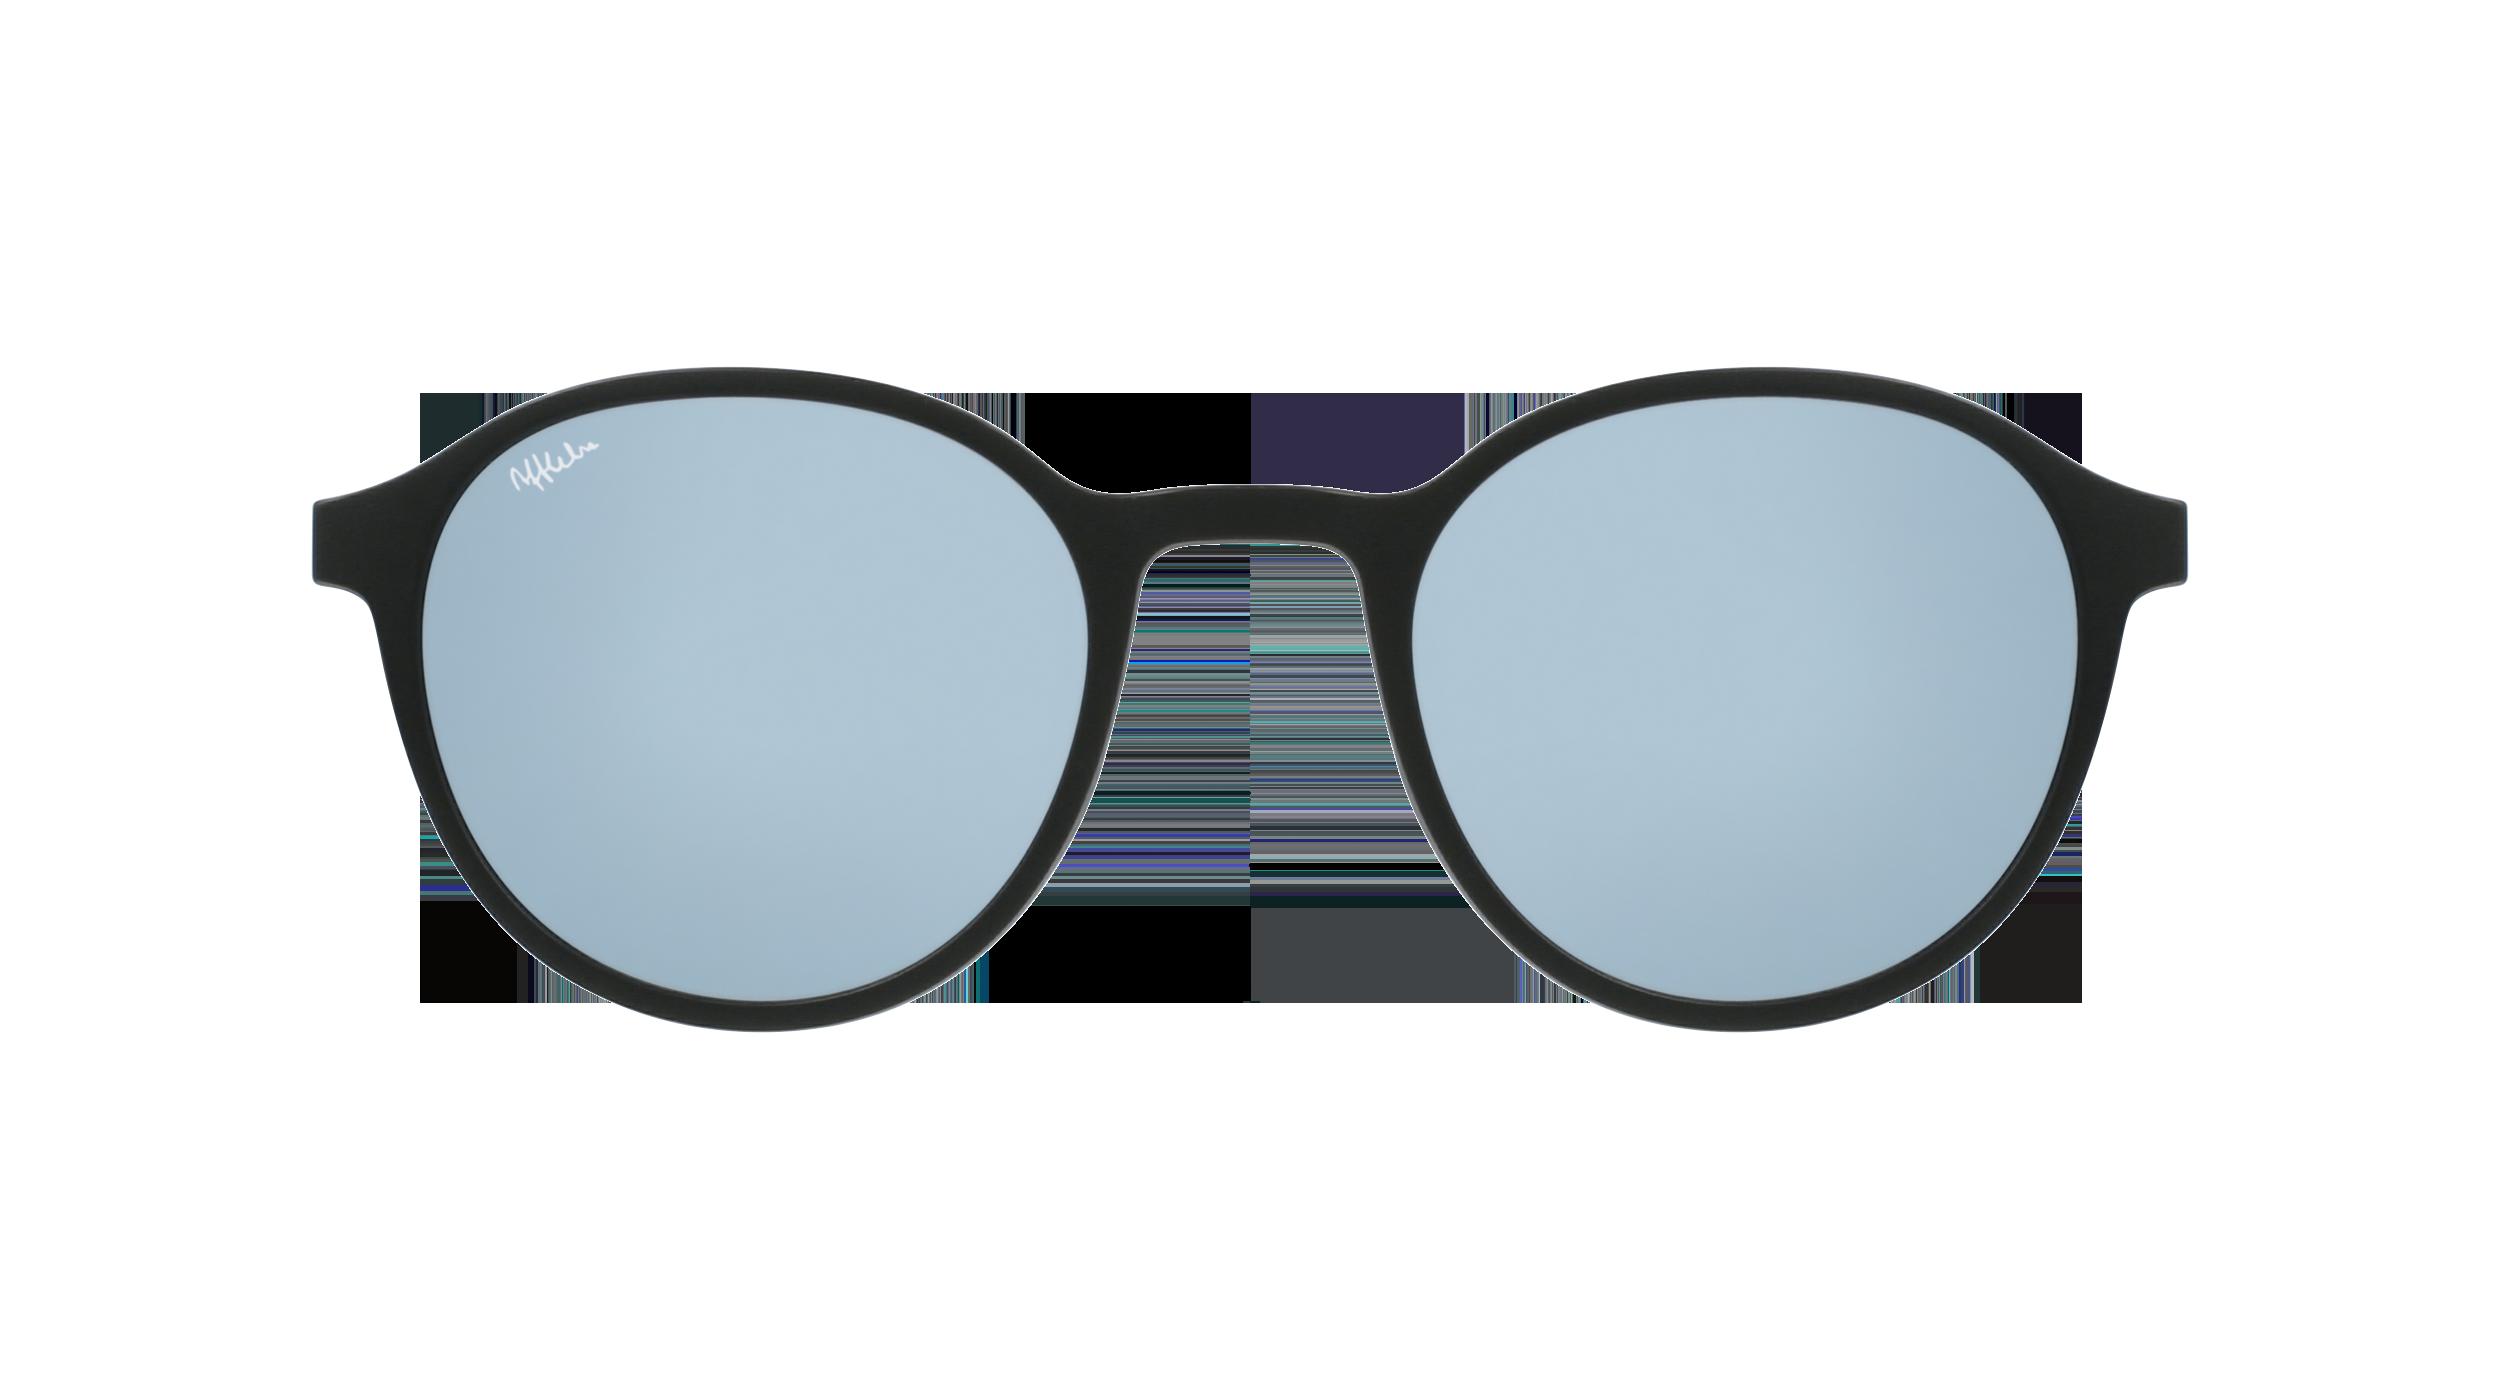 afflelou/france/products/smart_clip/clips_glasses/07630036458846.png